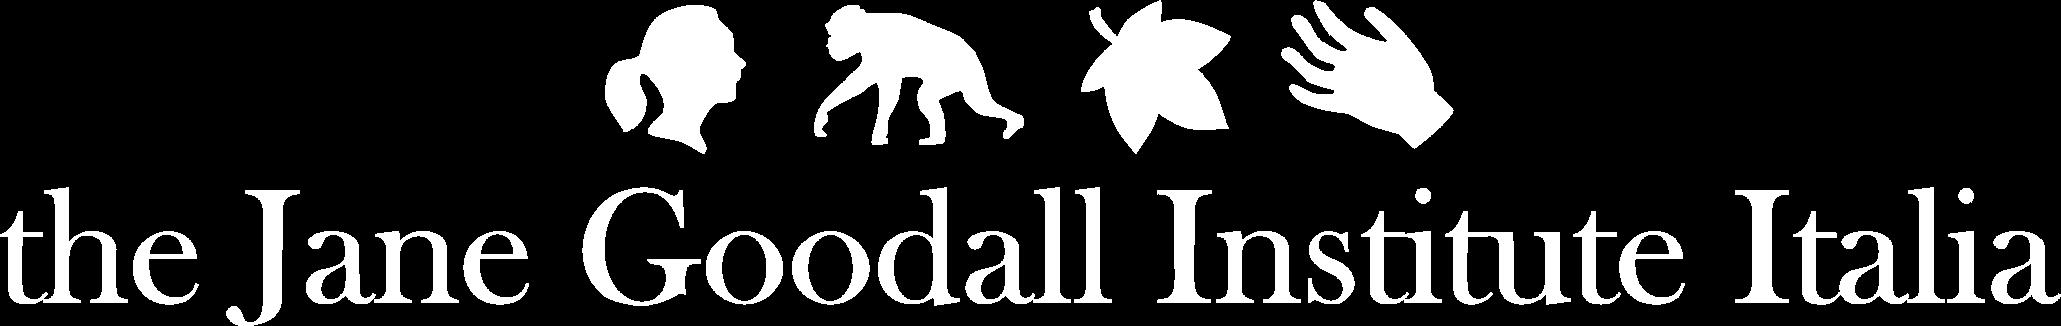 jgiitalia